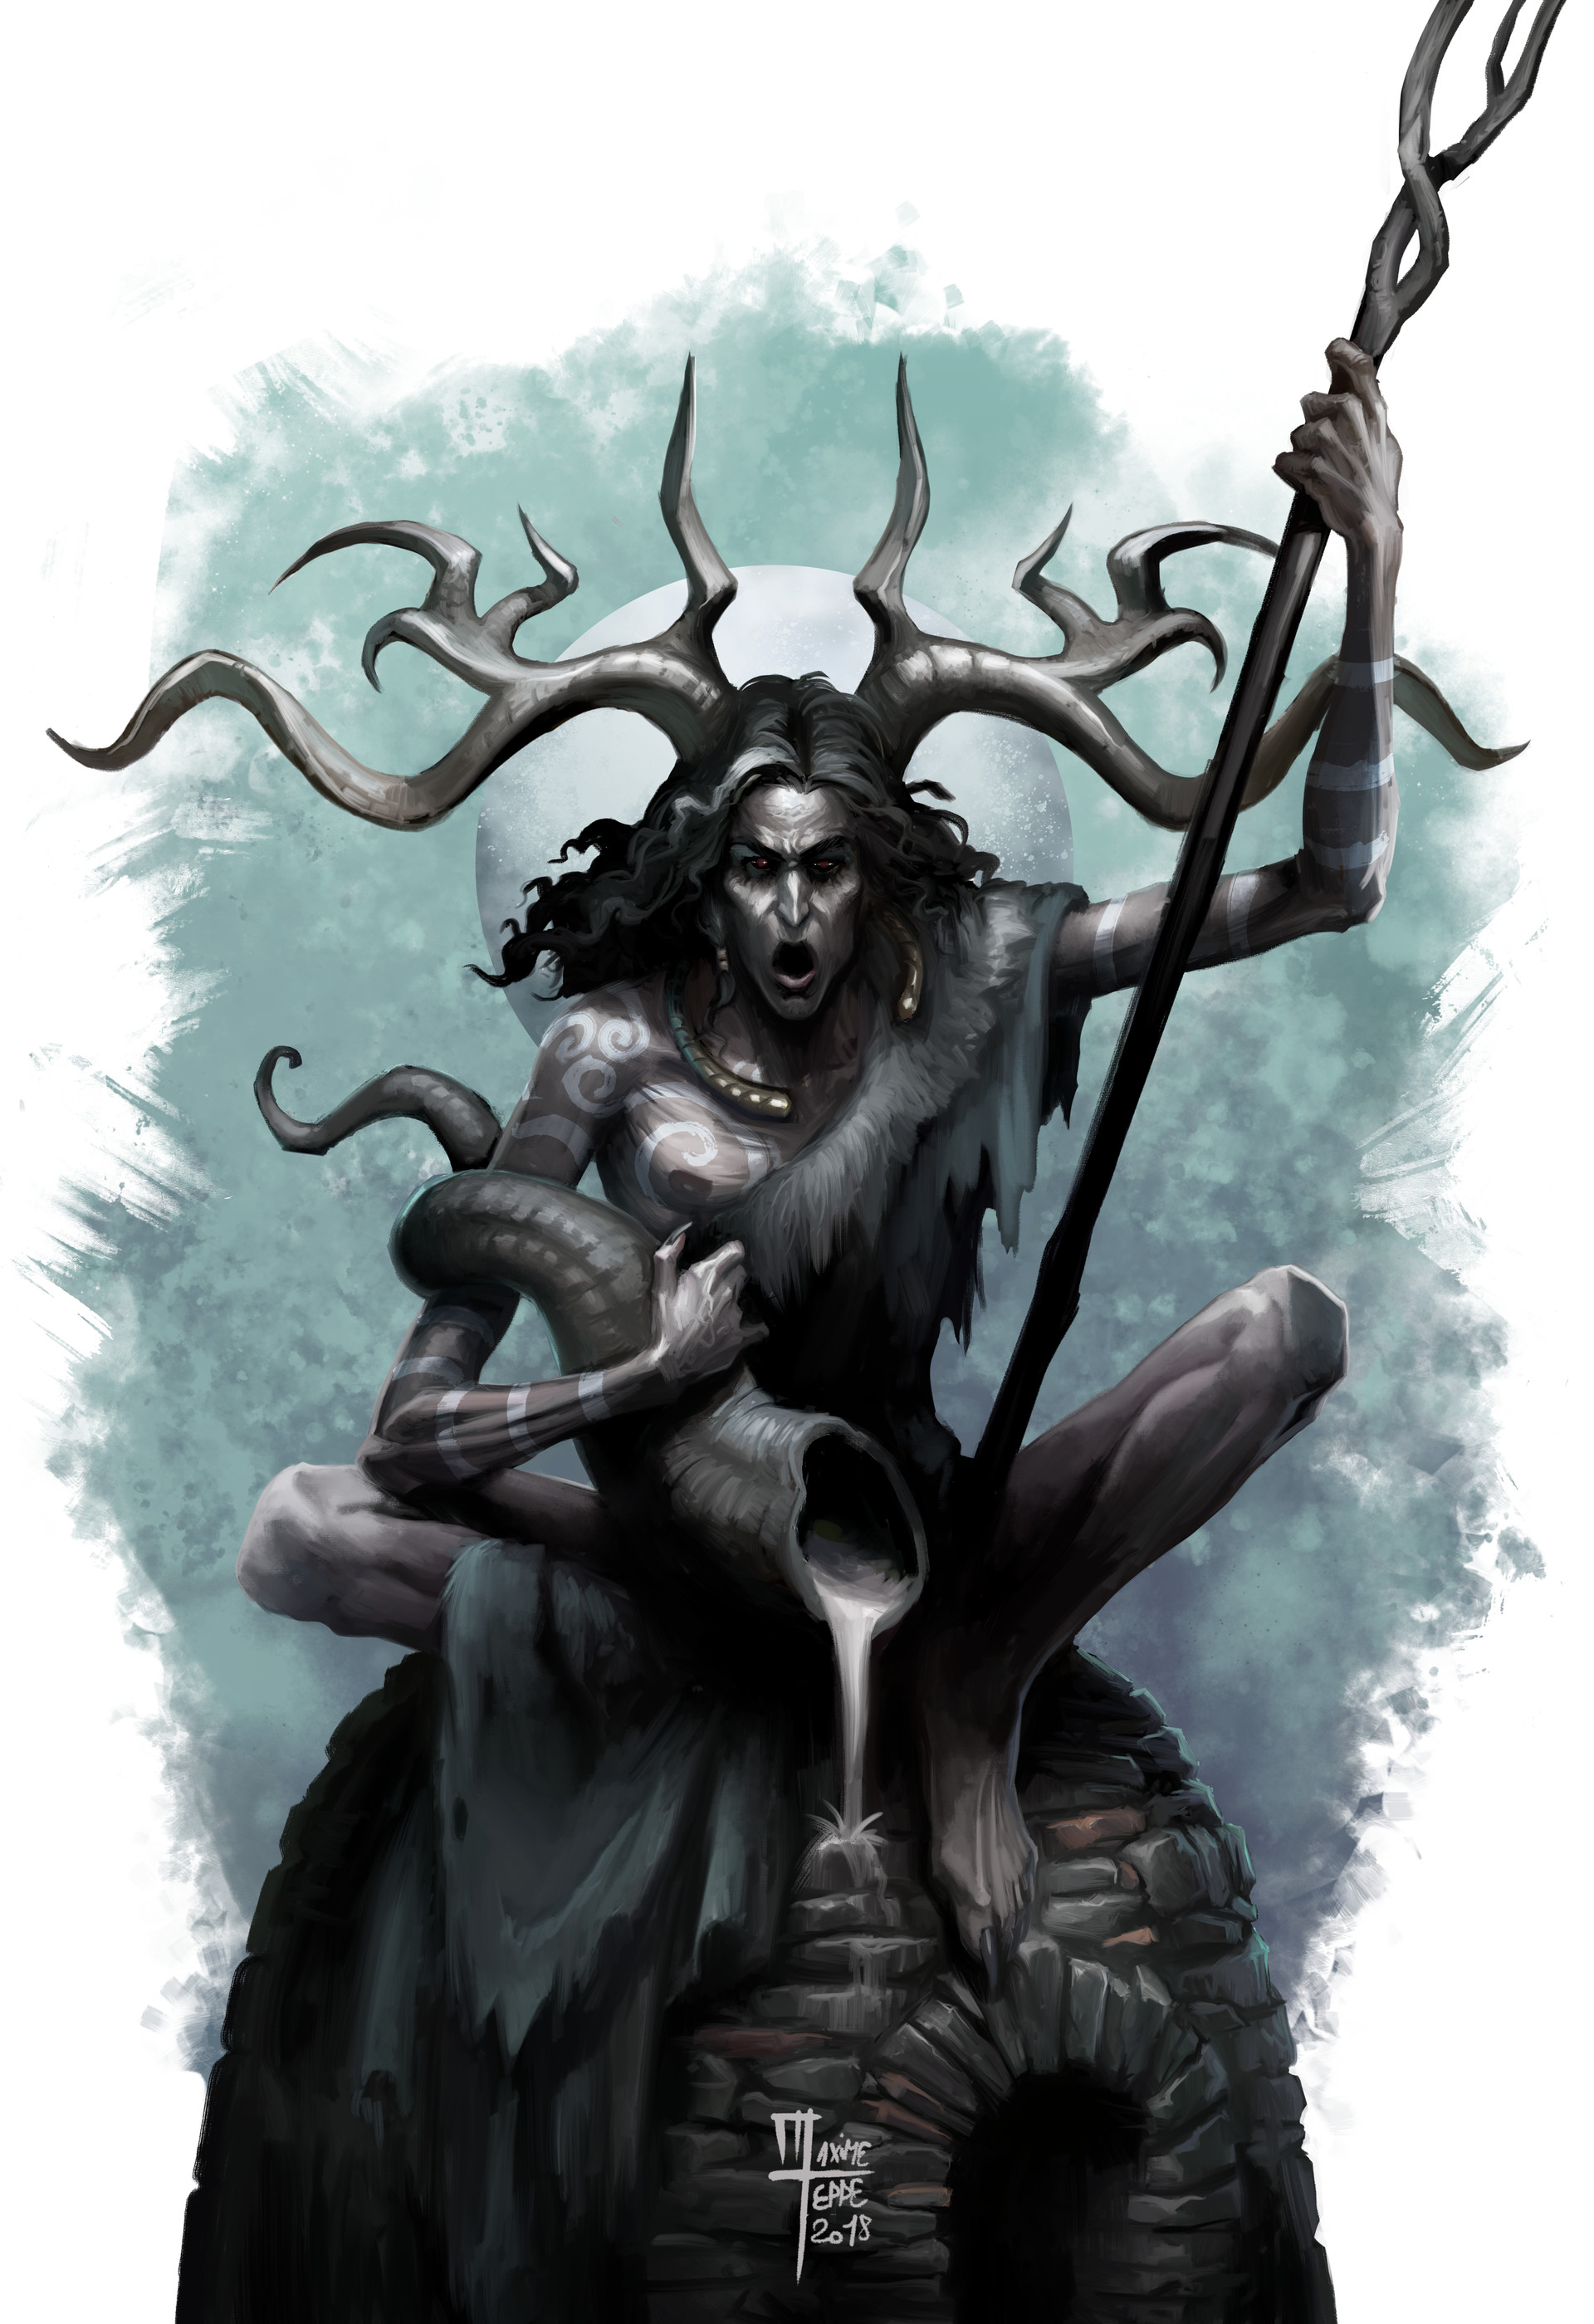 Cernunnos - avatar of nyarlatothep